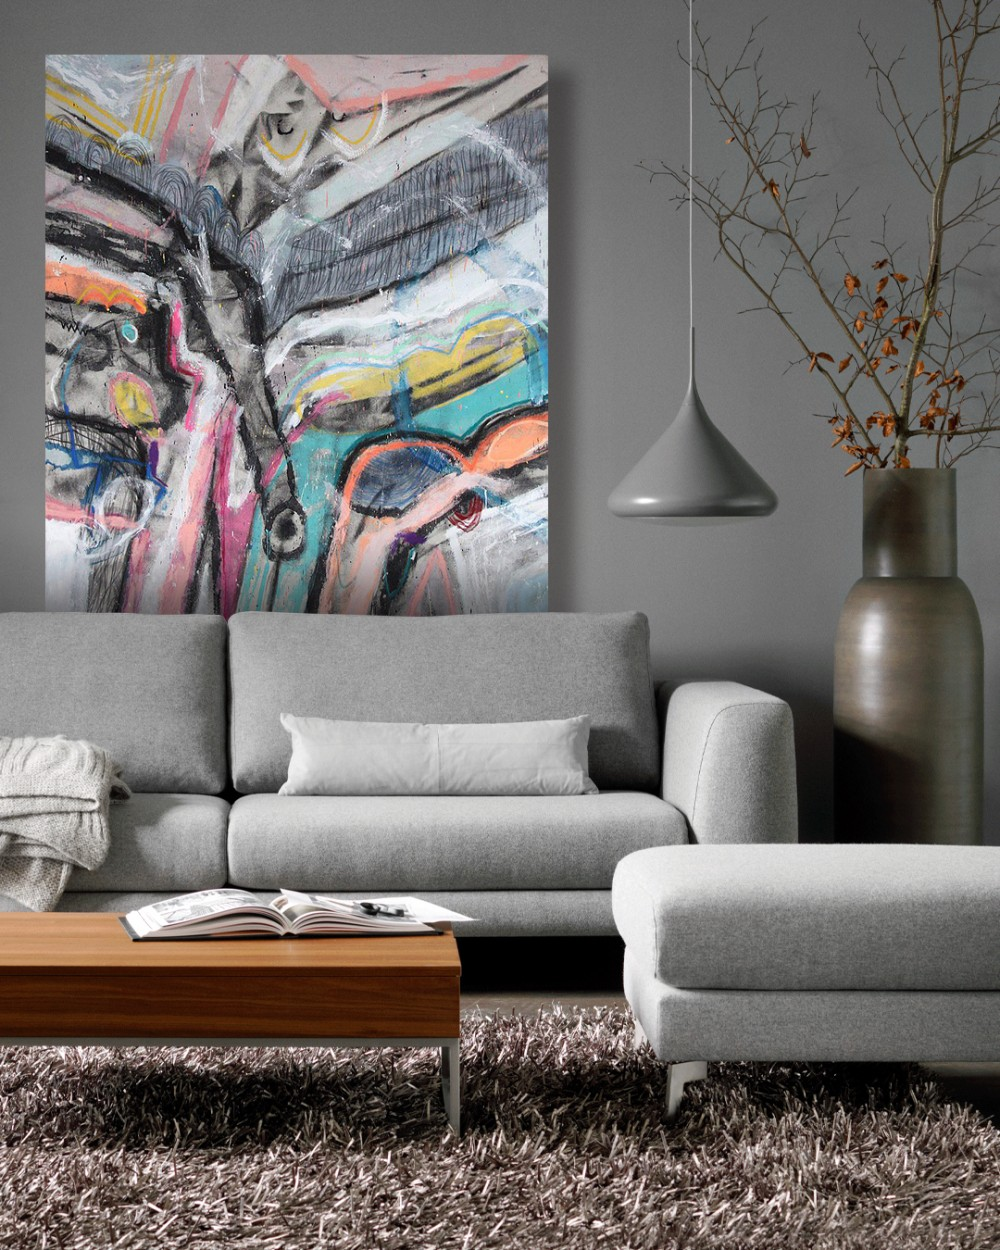 Bonartgallery | بن آرت گالری